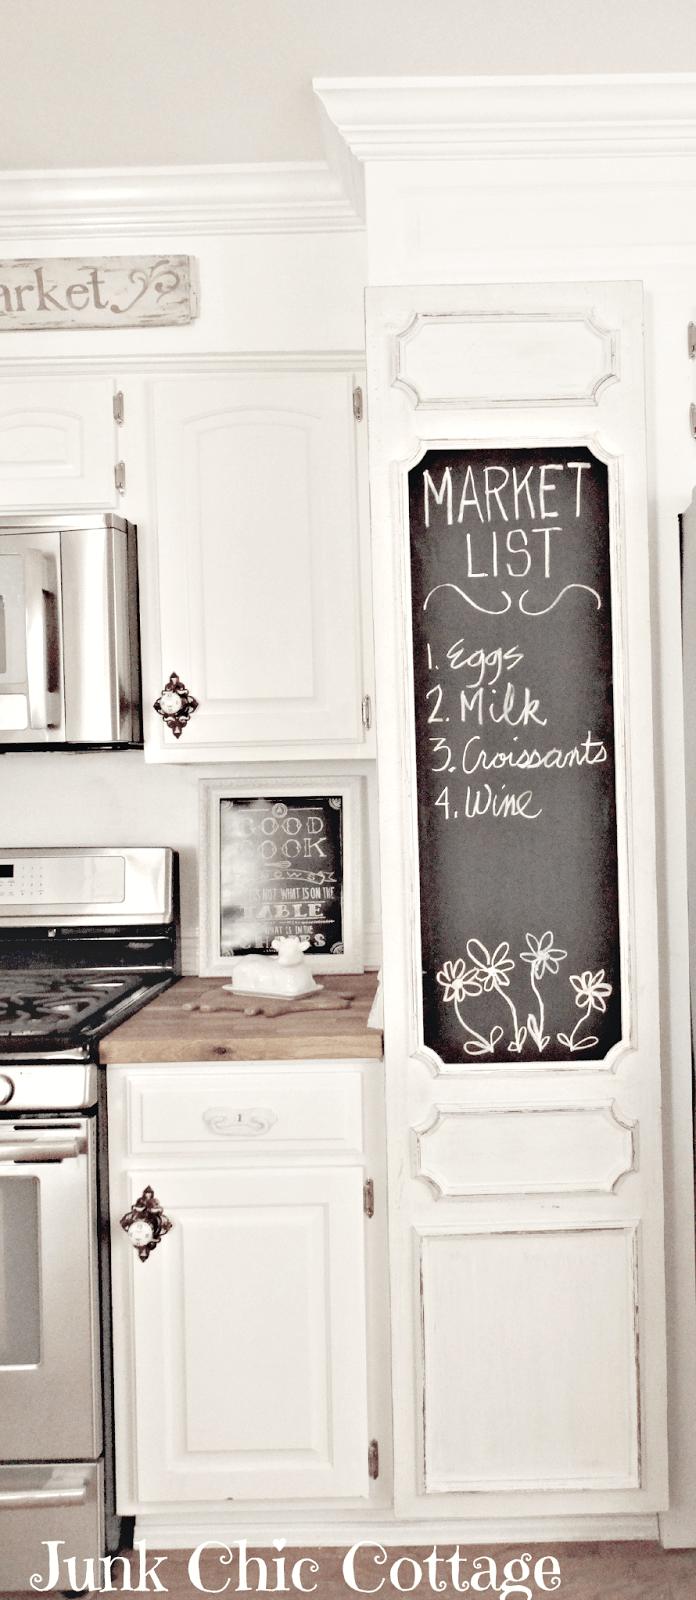 Pantry Door with Oversized Chalkboard